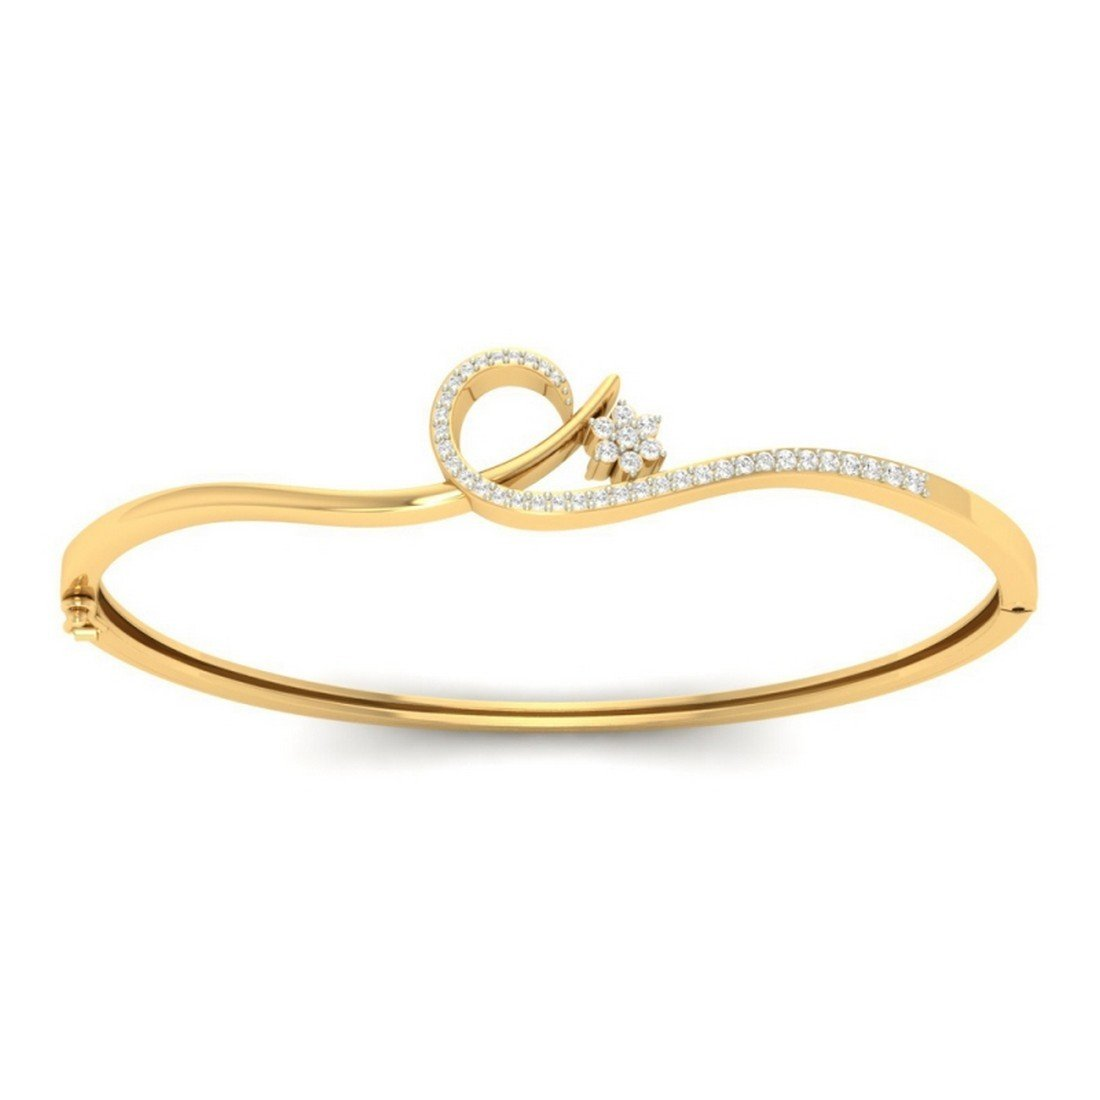 HallMarked IJ| SI 0.29 cttw Round-Cut-Diamond bangle-bracelets Size 14K Yellow Gold 8.25 inches